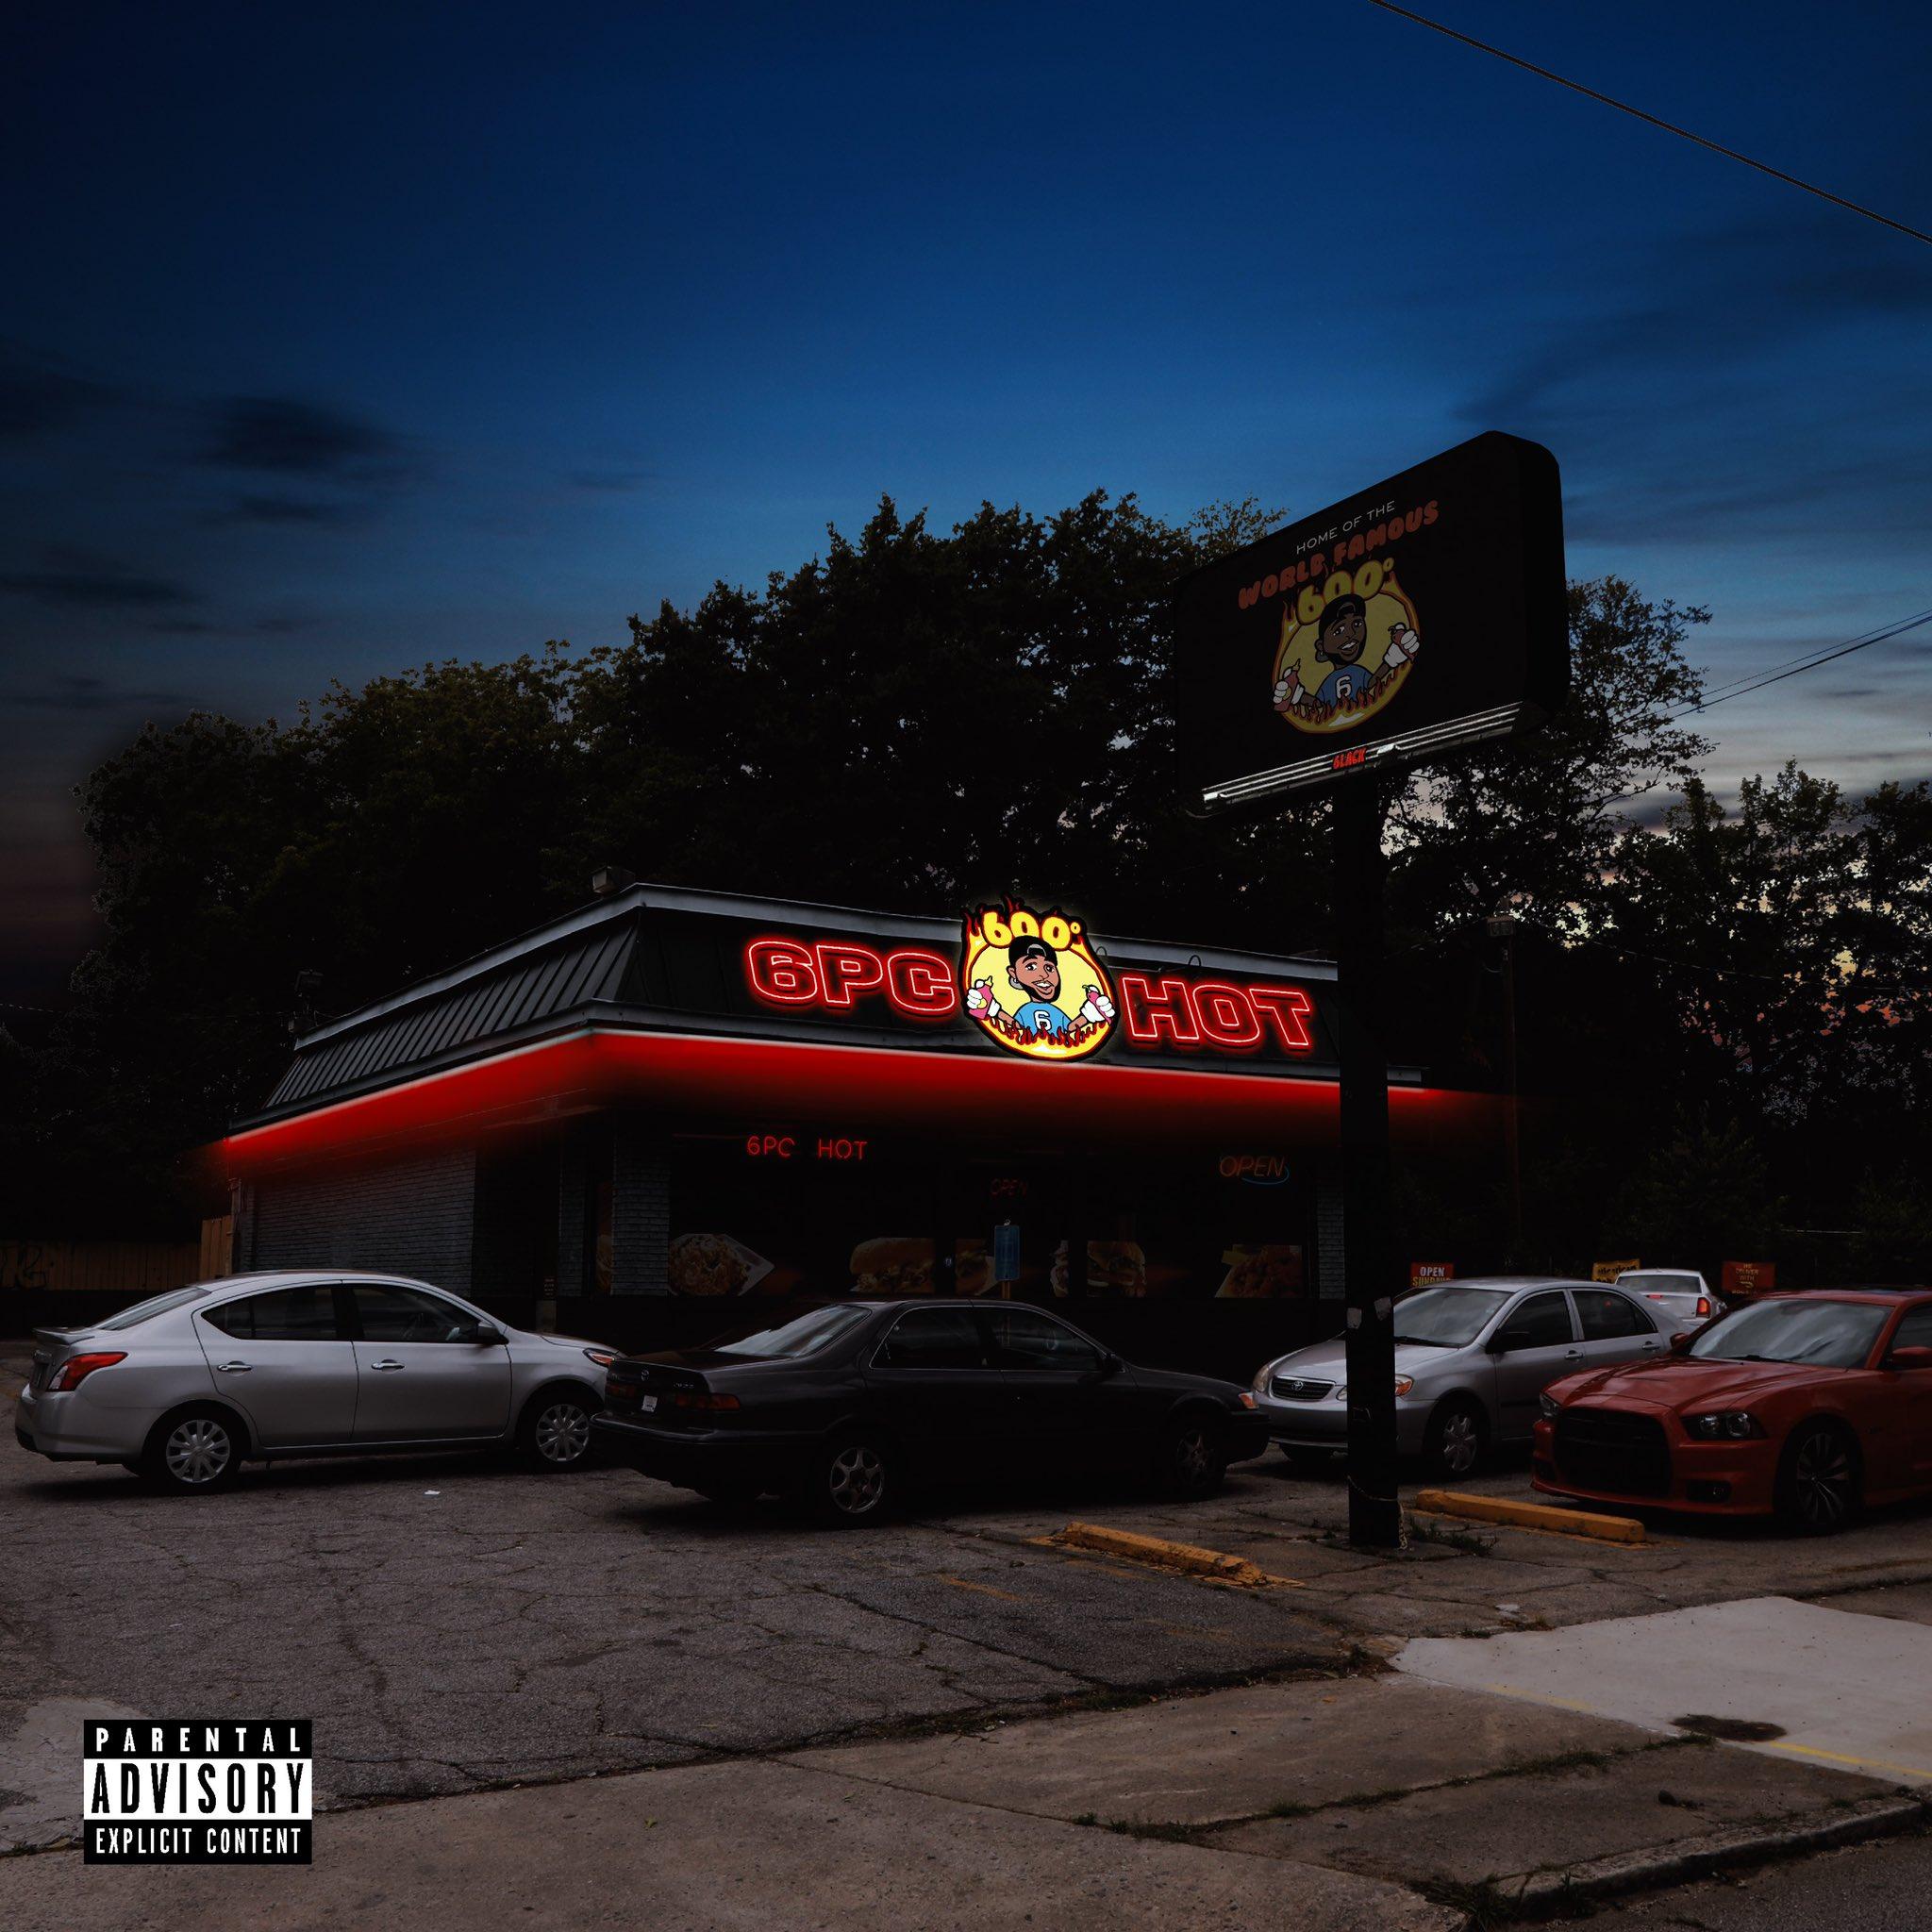 6lack'6pc Hot' EP